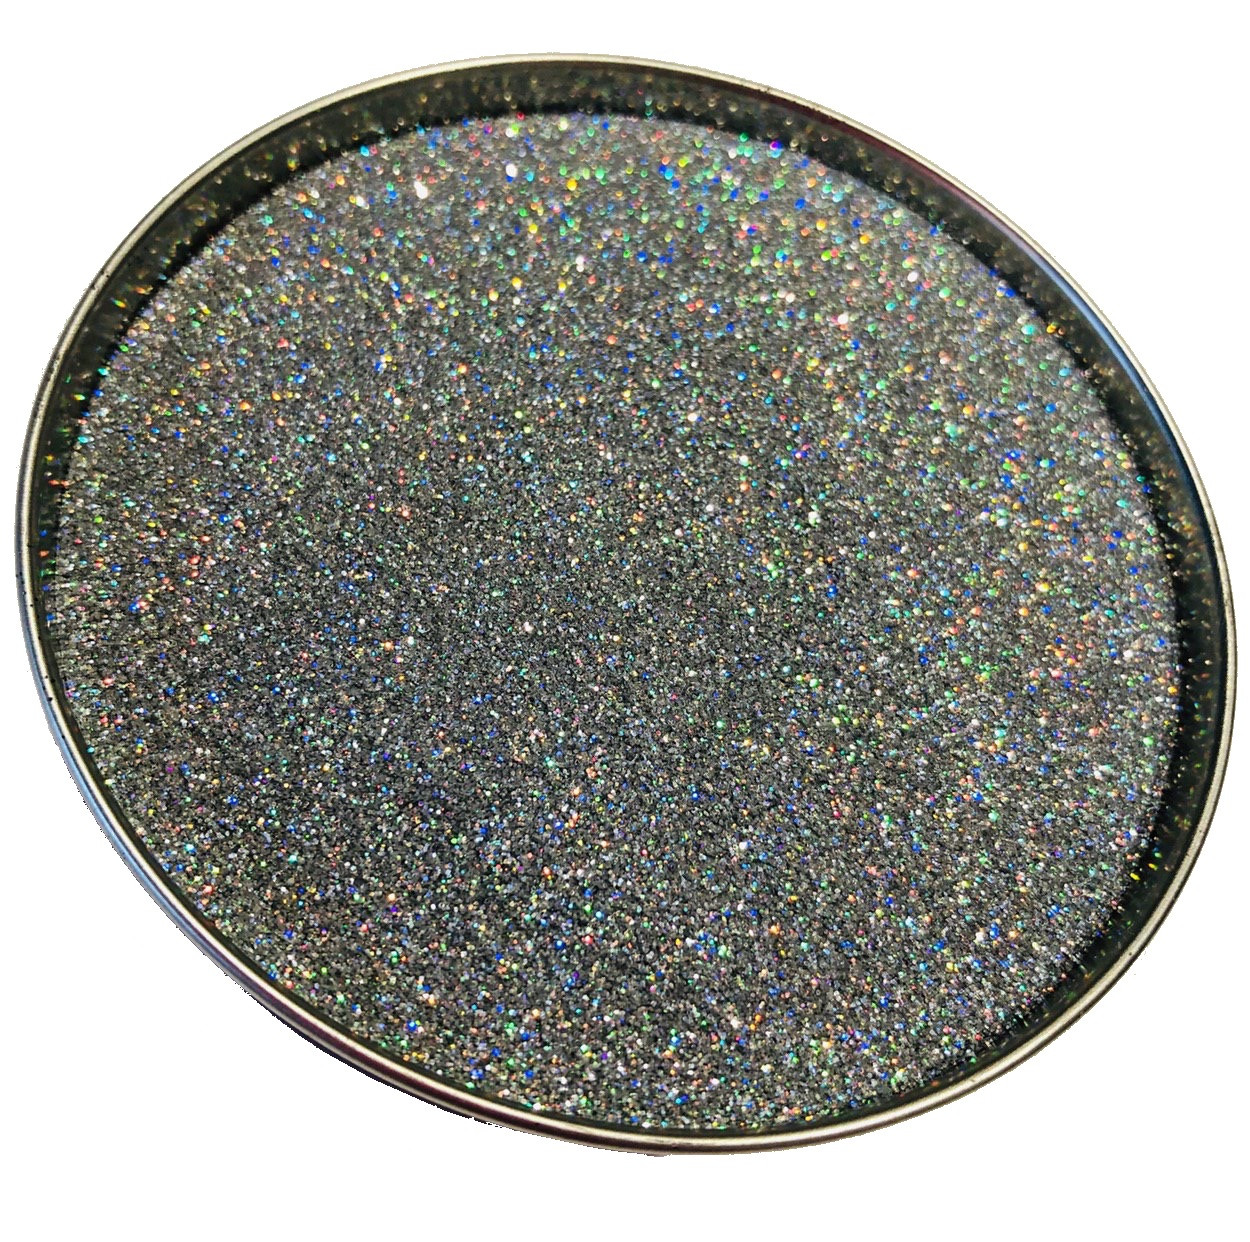 Глиттер  серебро галографическое TL001-128, 150мл